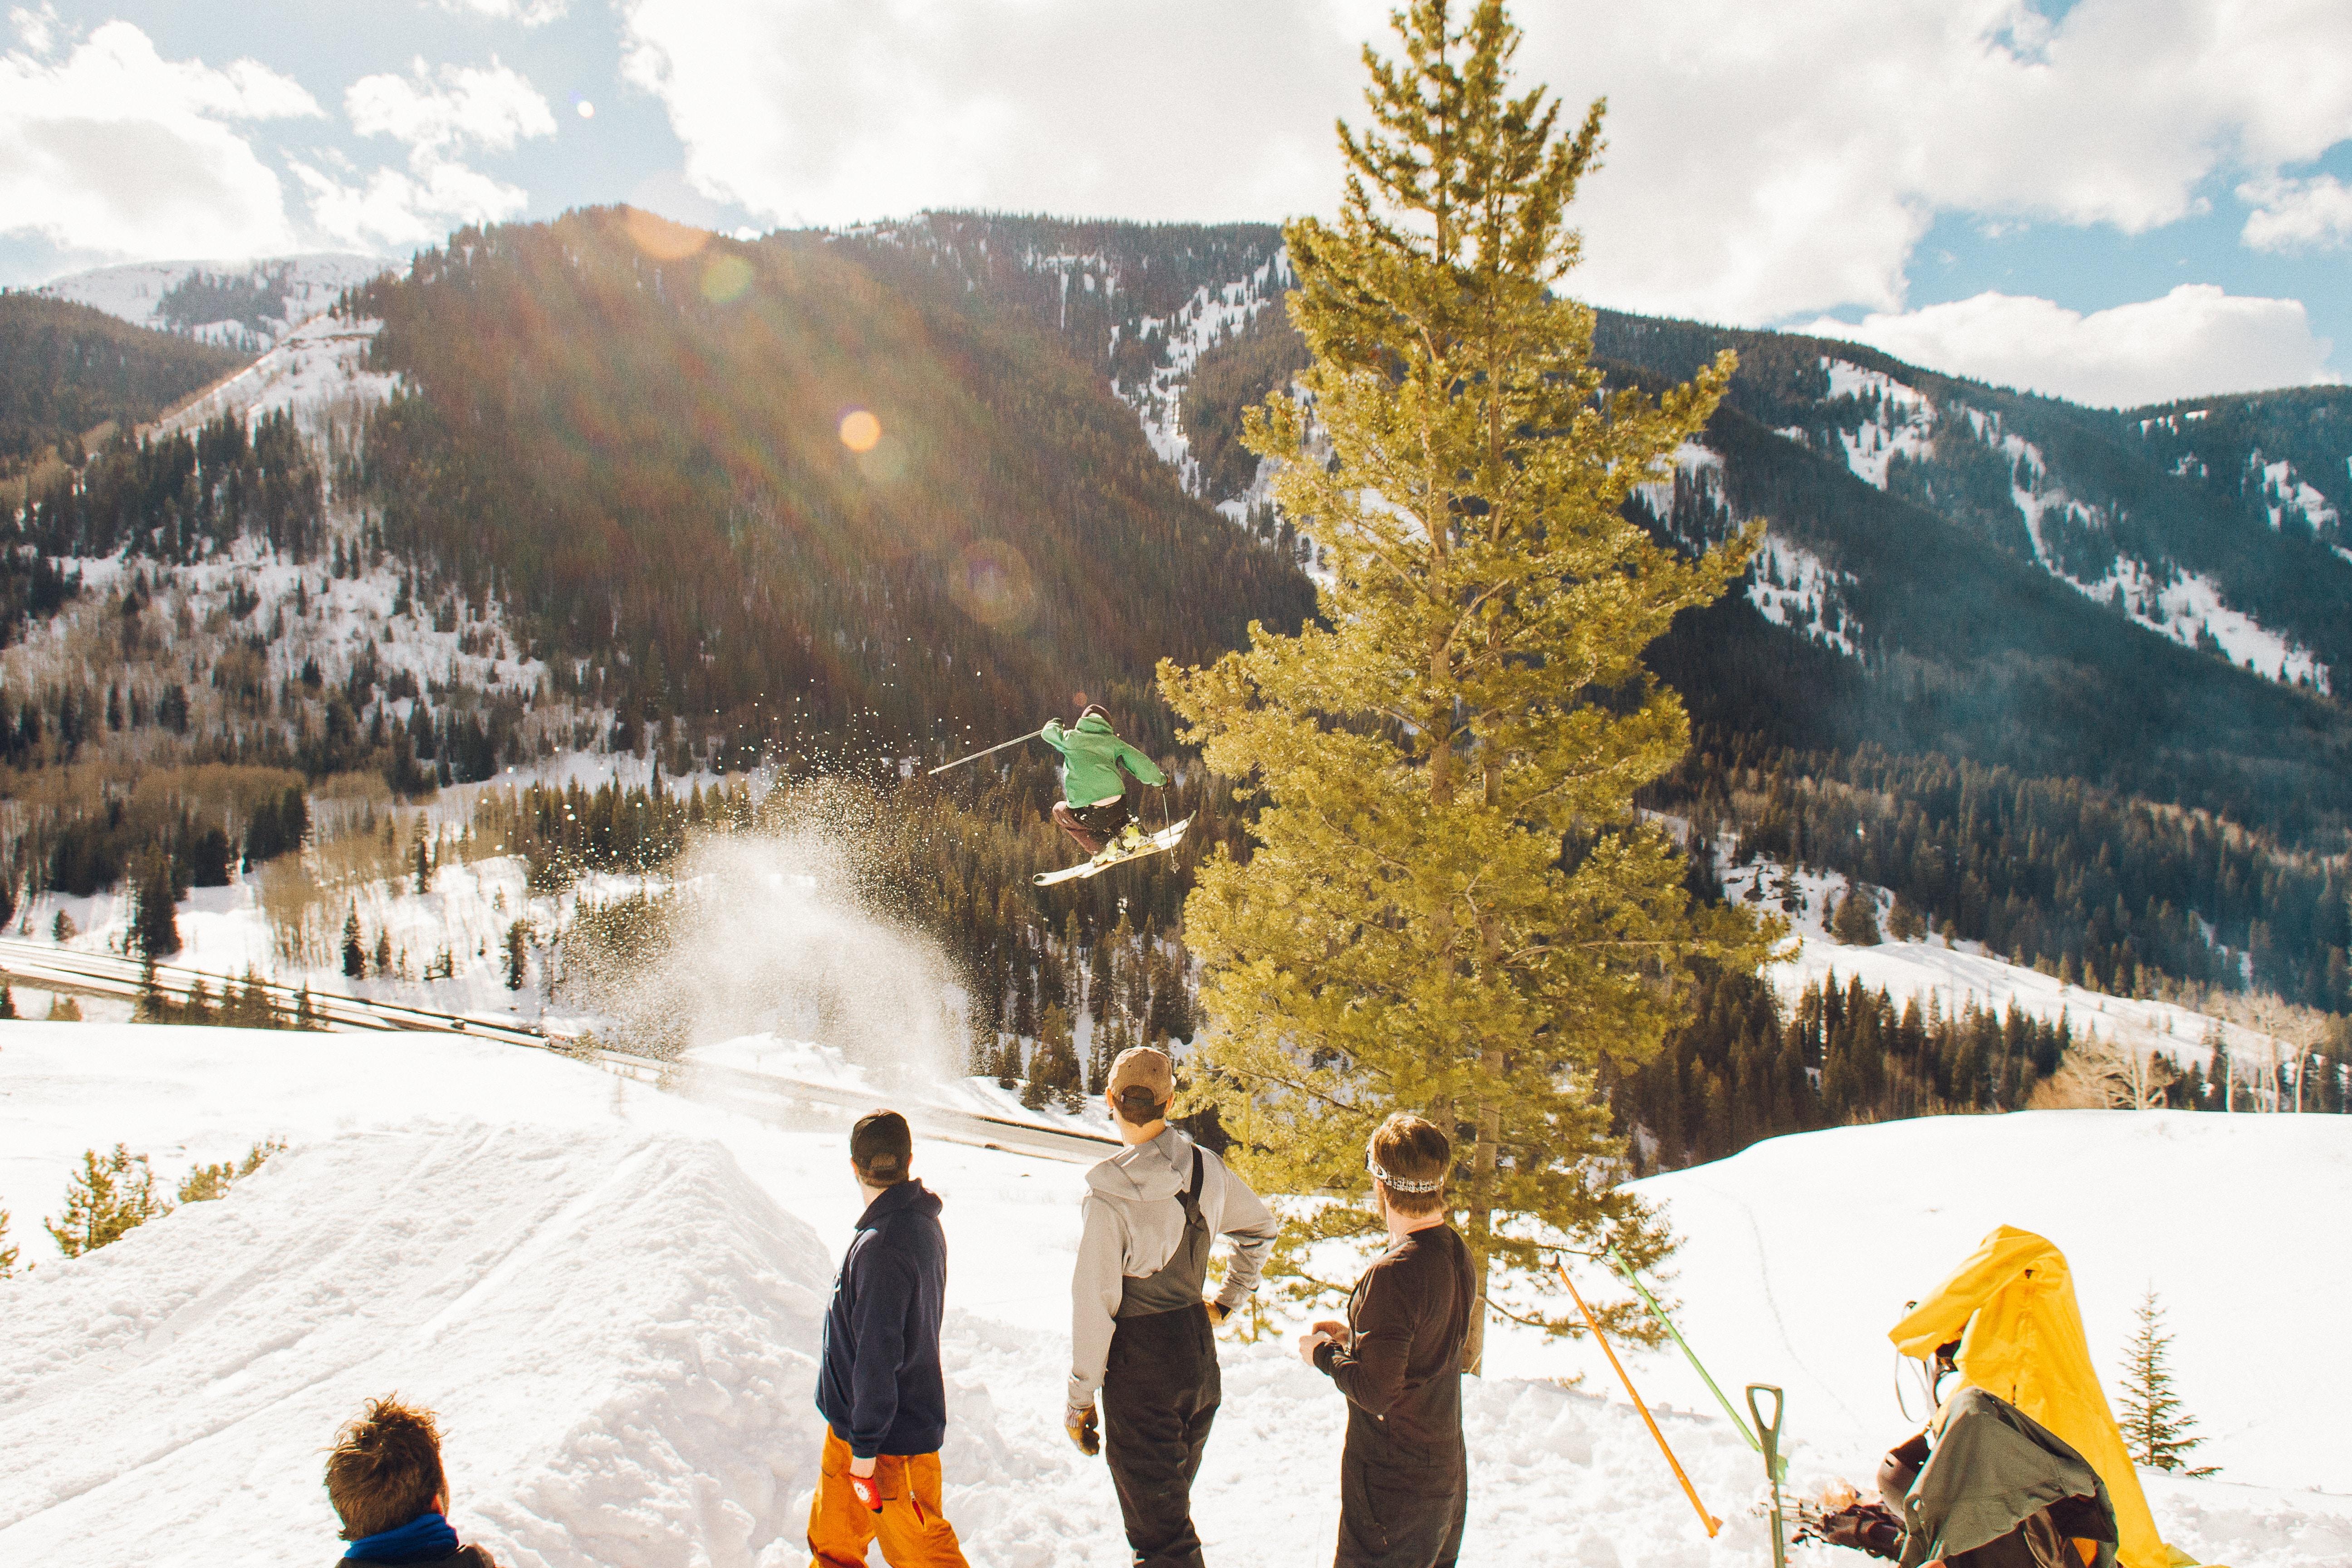 group of people on mountain peak during daytime